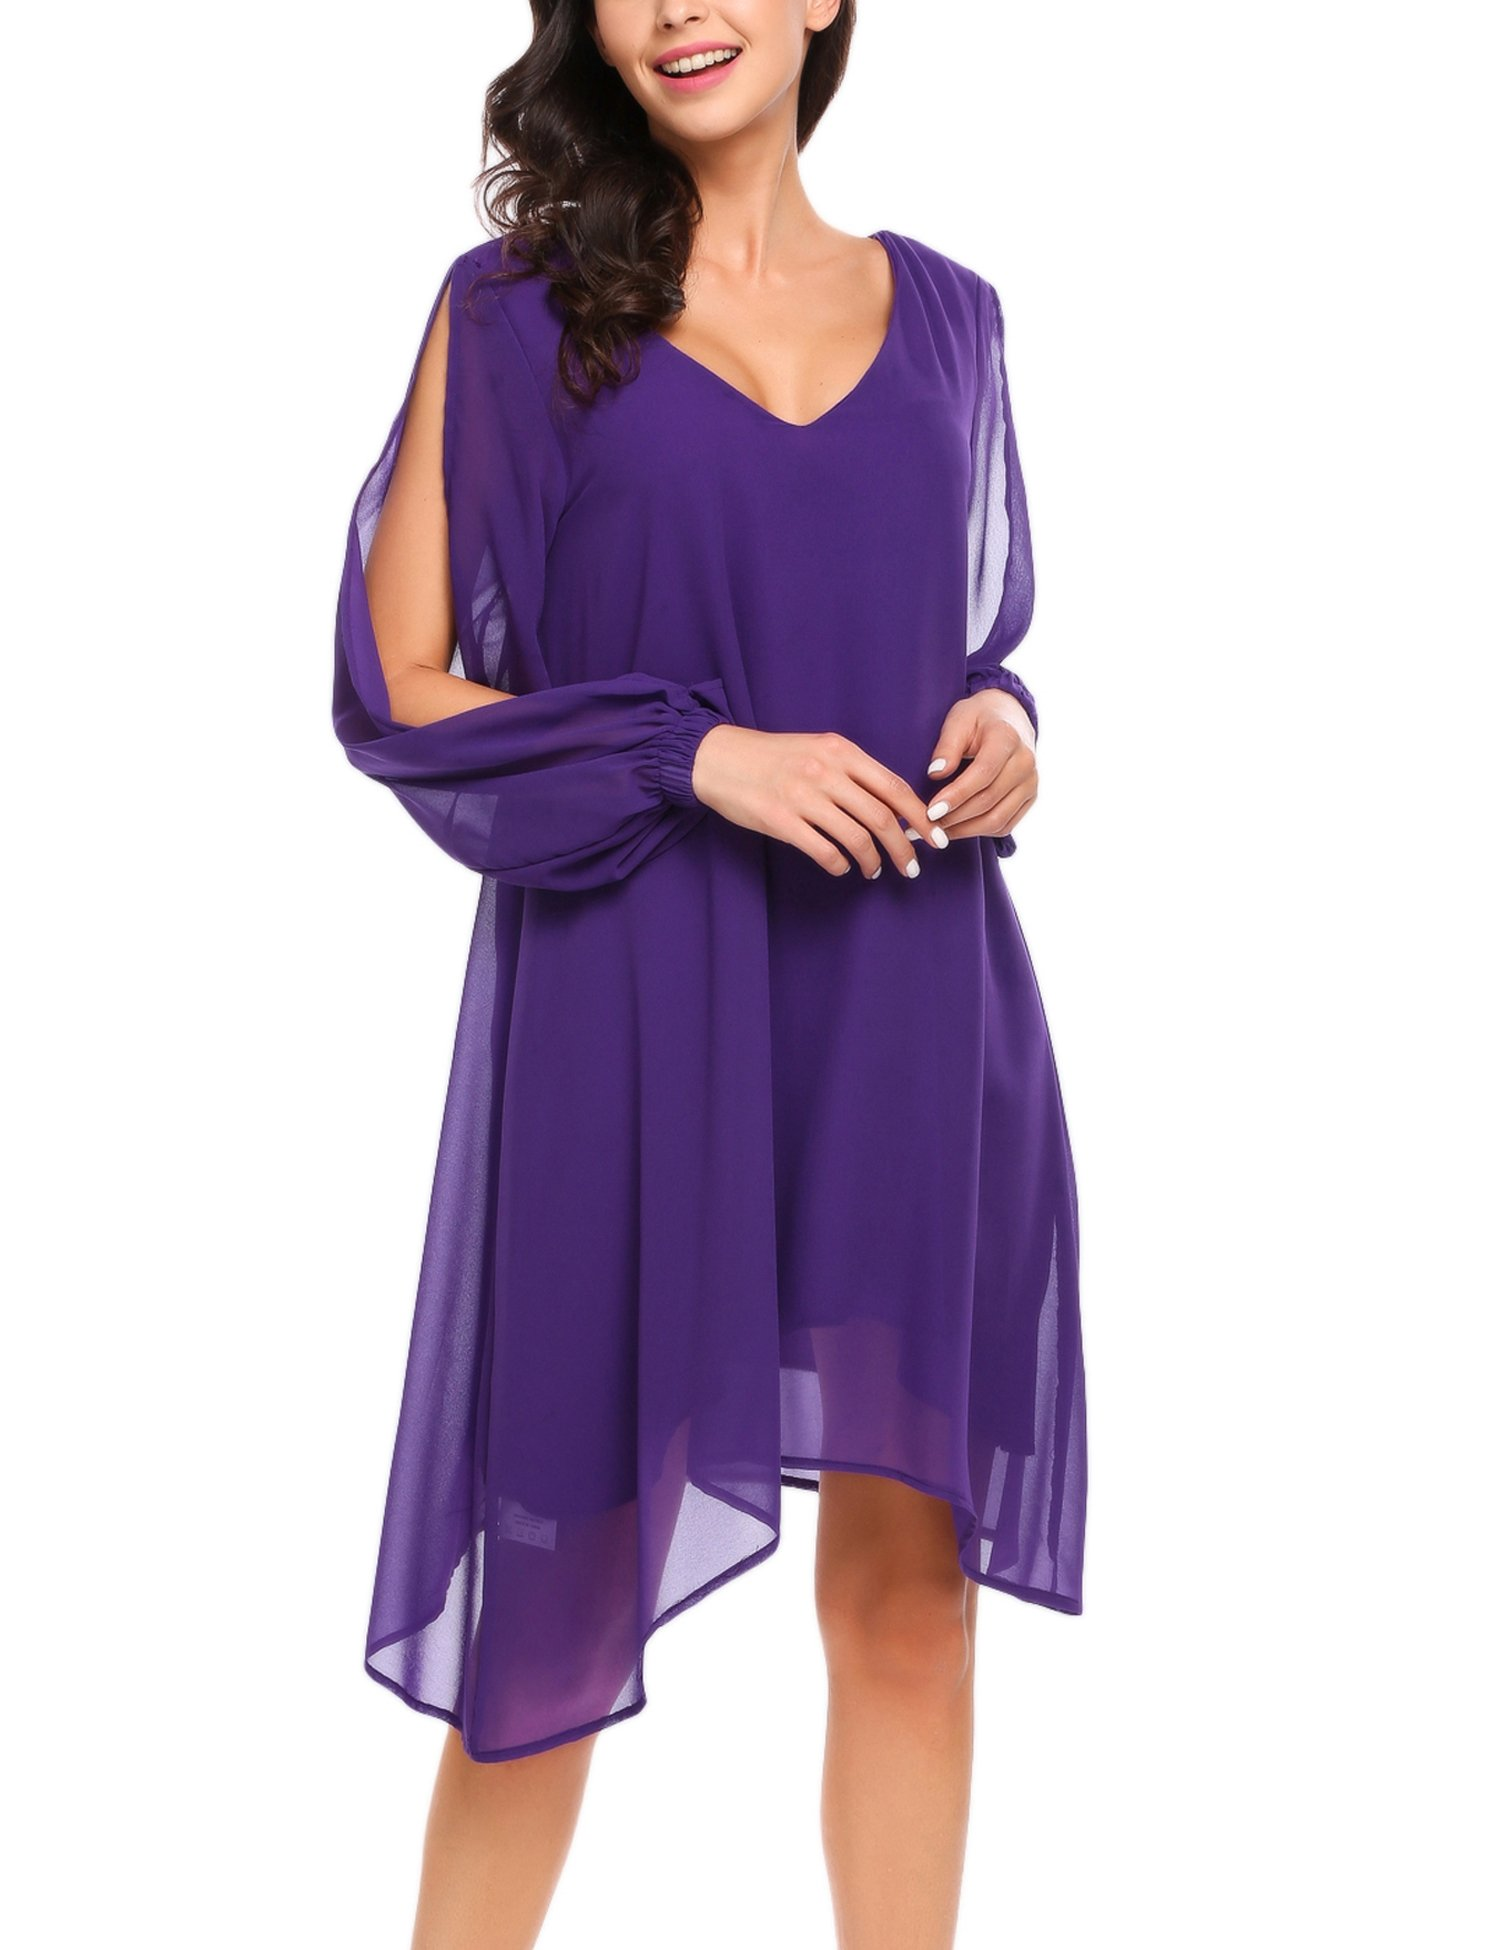 Women Loose Dress Beach Casual Dress Cut-off Long Sleeve V-neck Asymmetric Hem Chiffon Zeagoo,Purple,Small